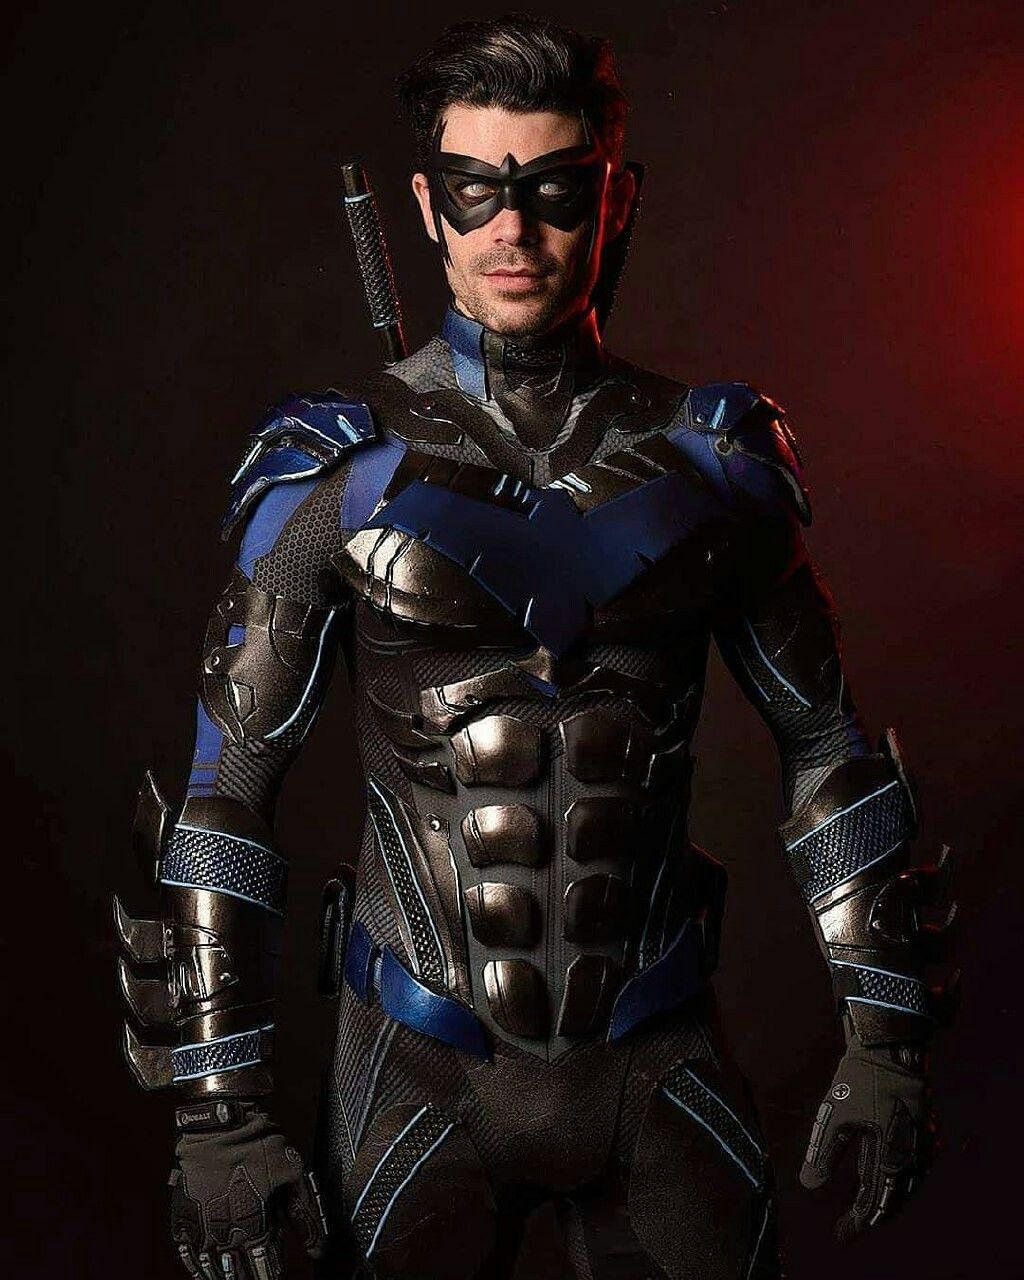 SNEAK PEEK: DCs Nightwing In Action